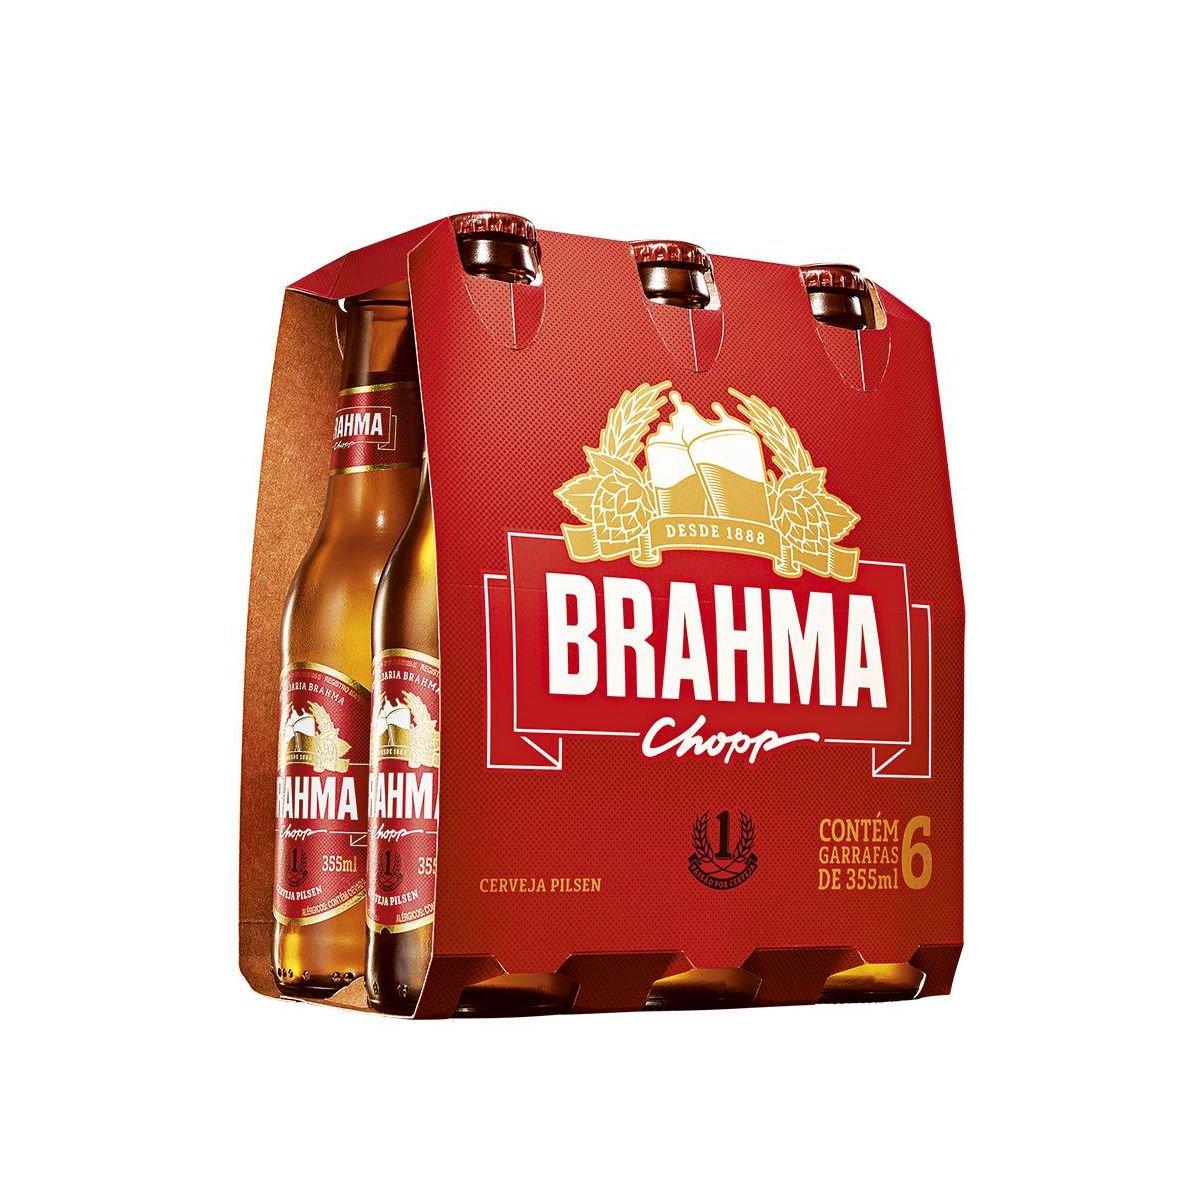 Cerveja BRAHMA Long Neck Garrafa 355ml. prev adda71f332